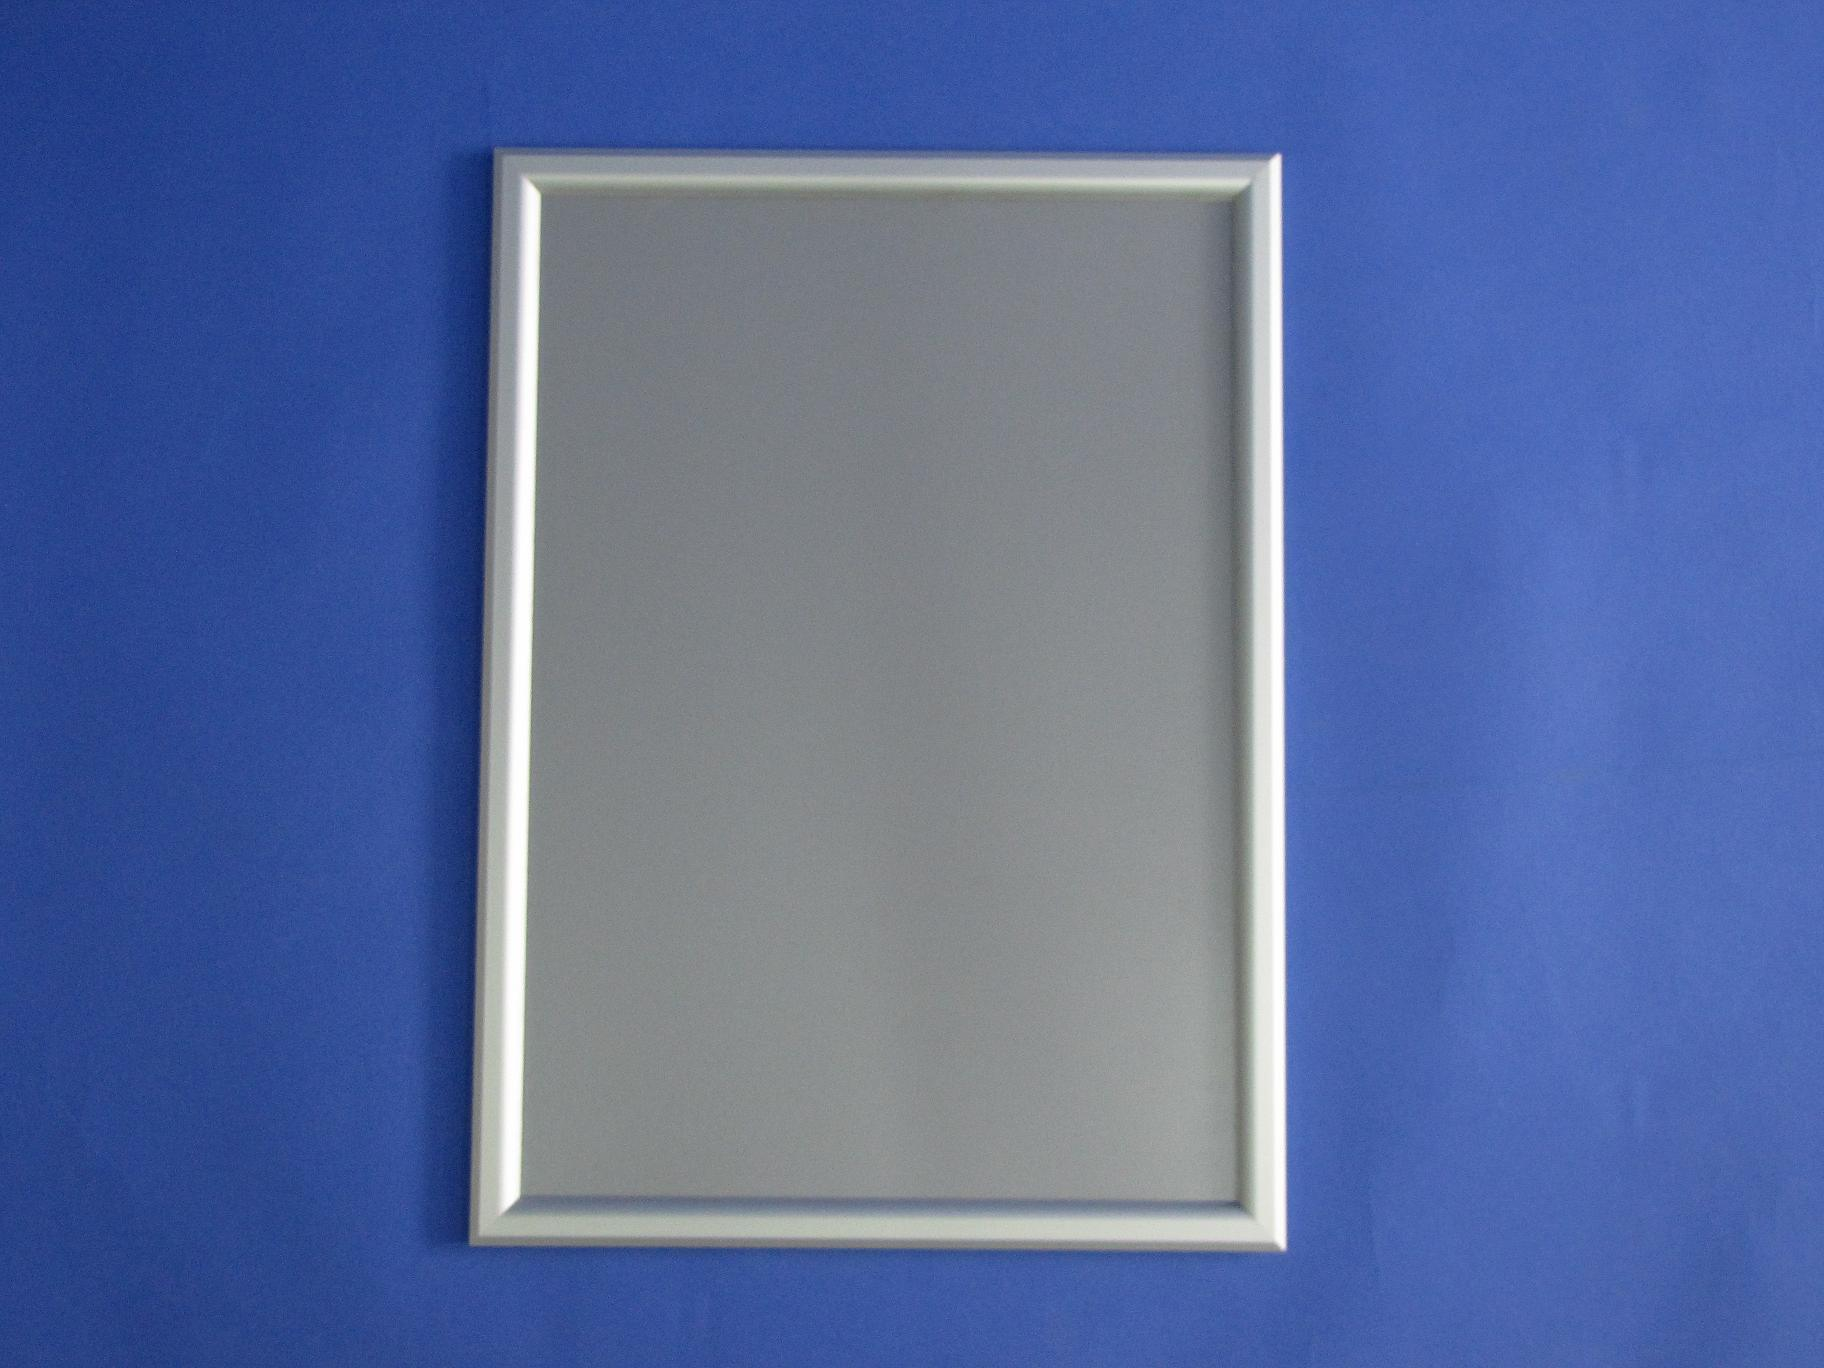 21 x 62 plastic frame